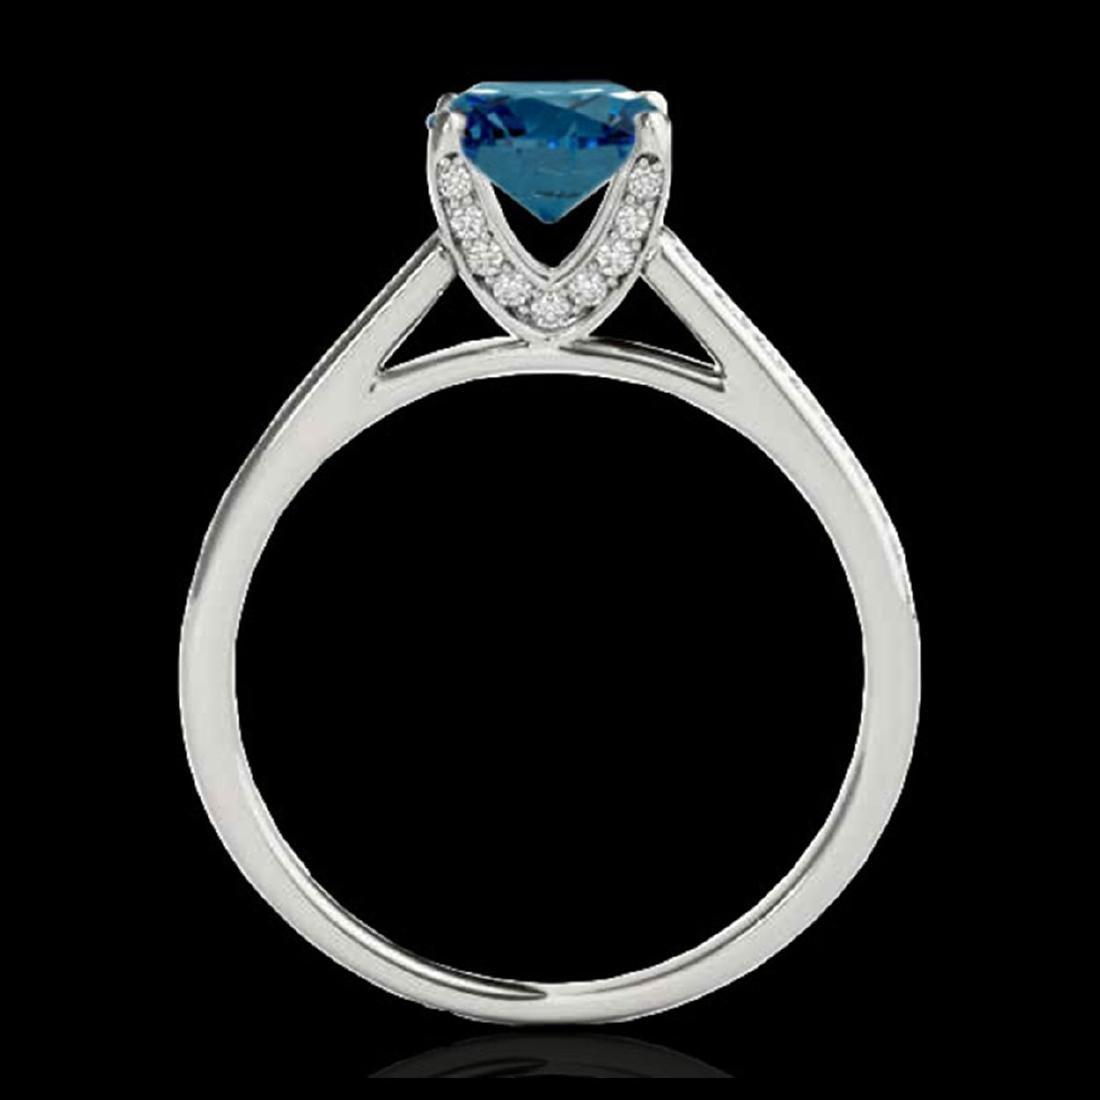 1.5 ctw SI Fancy Blue Diamond Solitaire Ring 10K White - 2